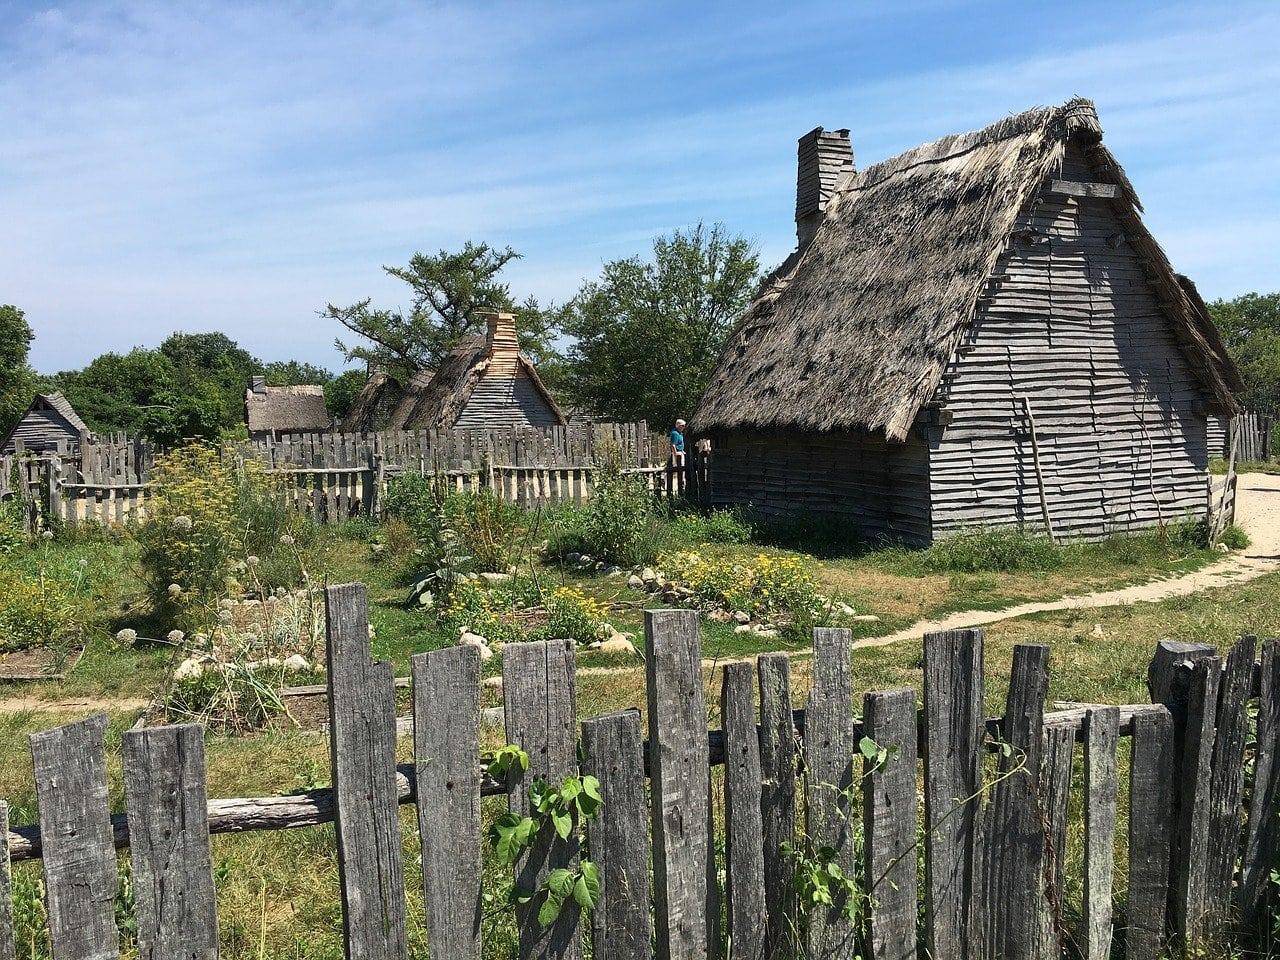 The 17th-century English village replica at Plimouth Plantation